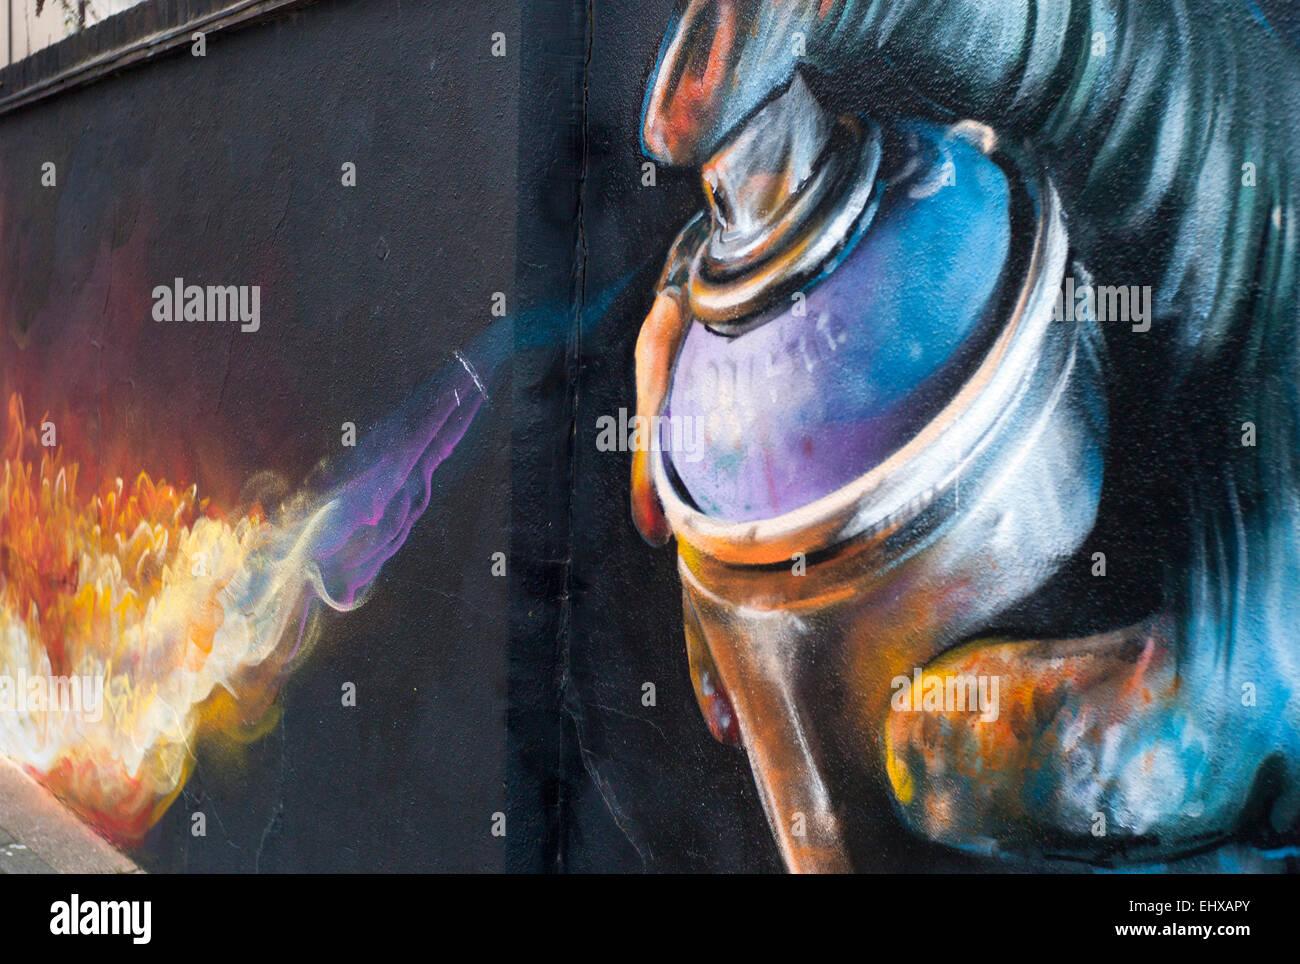 Fire From Paint Can Spray Graffiti Street Art Black Wall Kentish Stock Photo Royalty Free Image